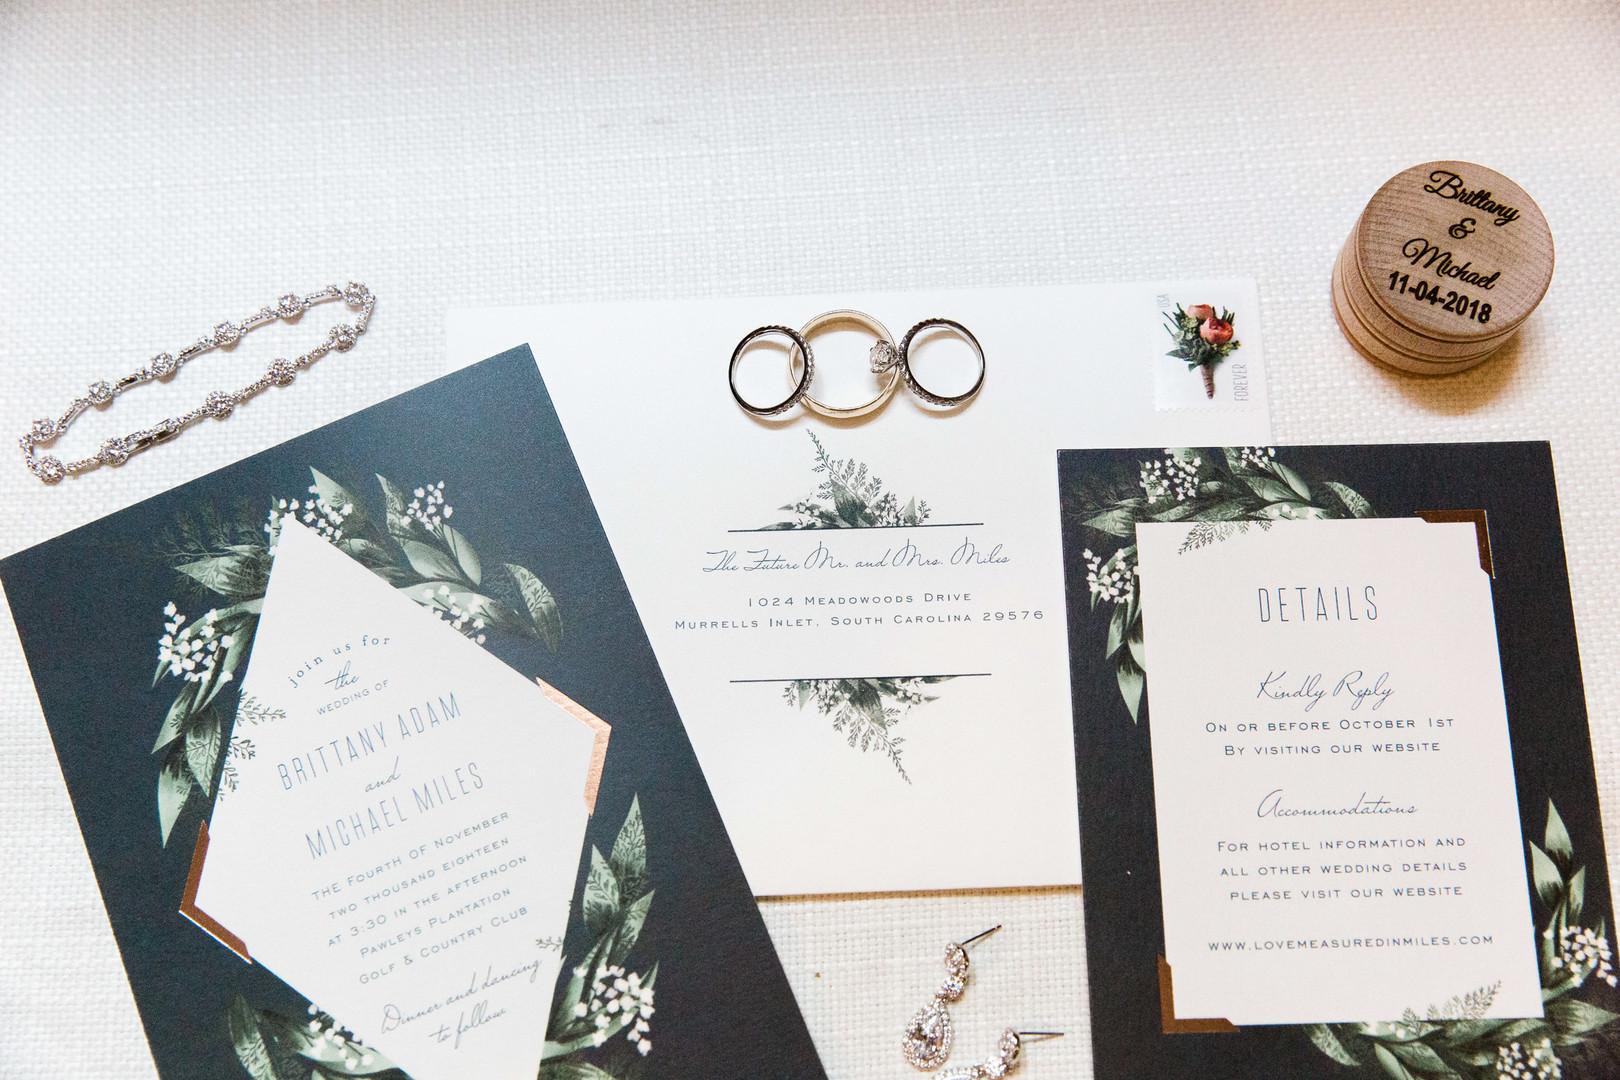 pawleys-plantation-wedding-7.jpg